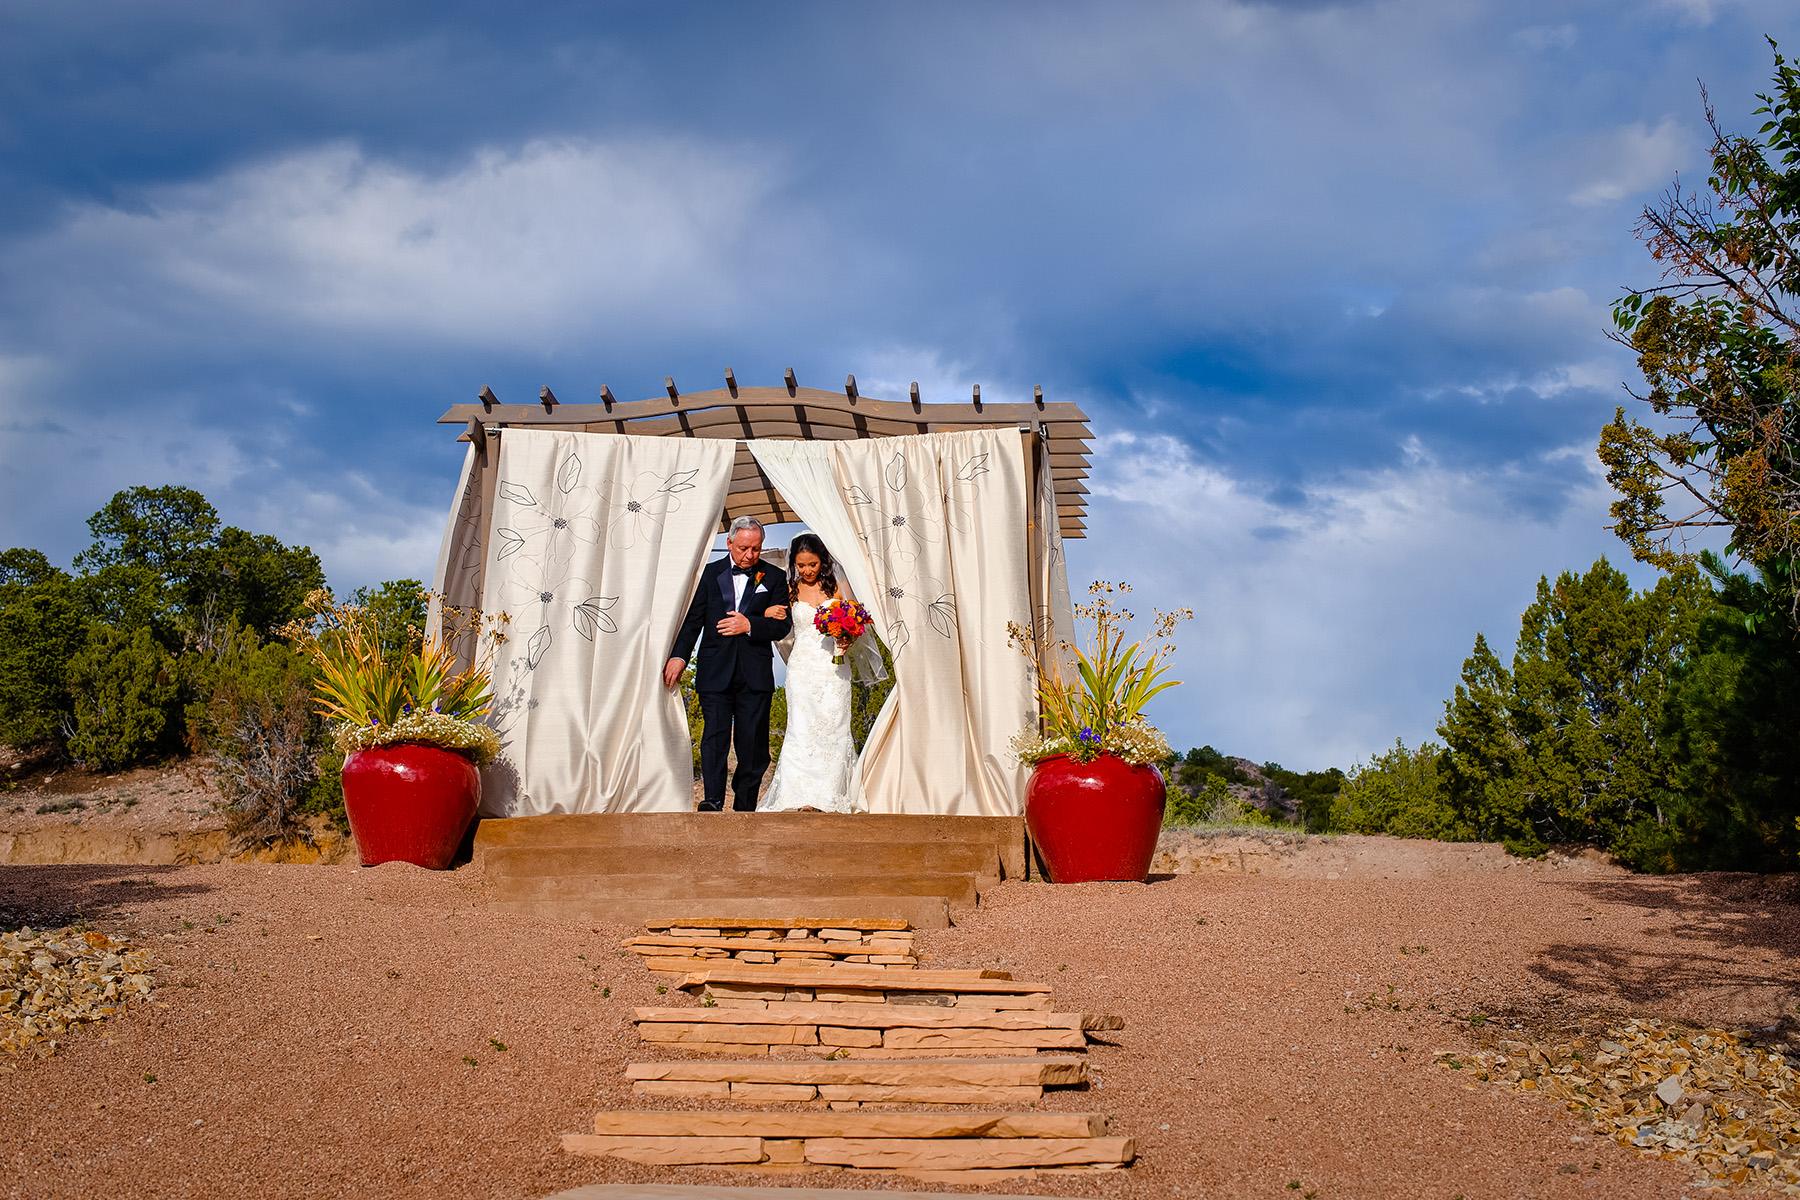 Tabitha-Dallas-wedding-four-seasons-resort-rancho-encantado-santa-fe-new-mexico-1020